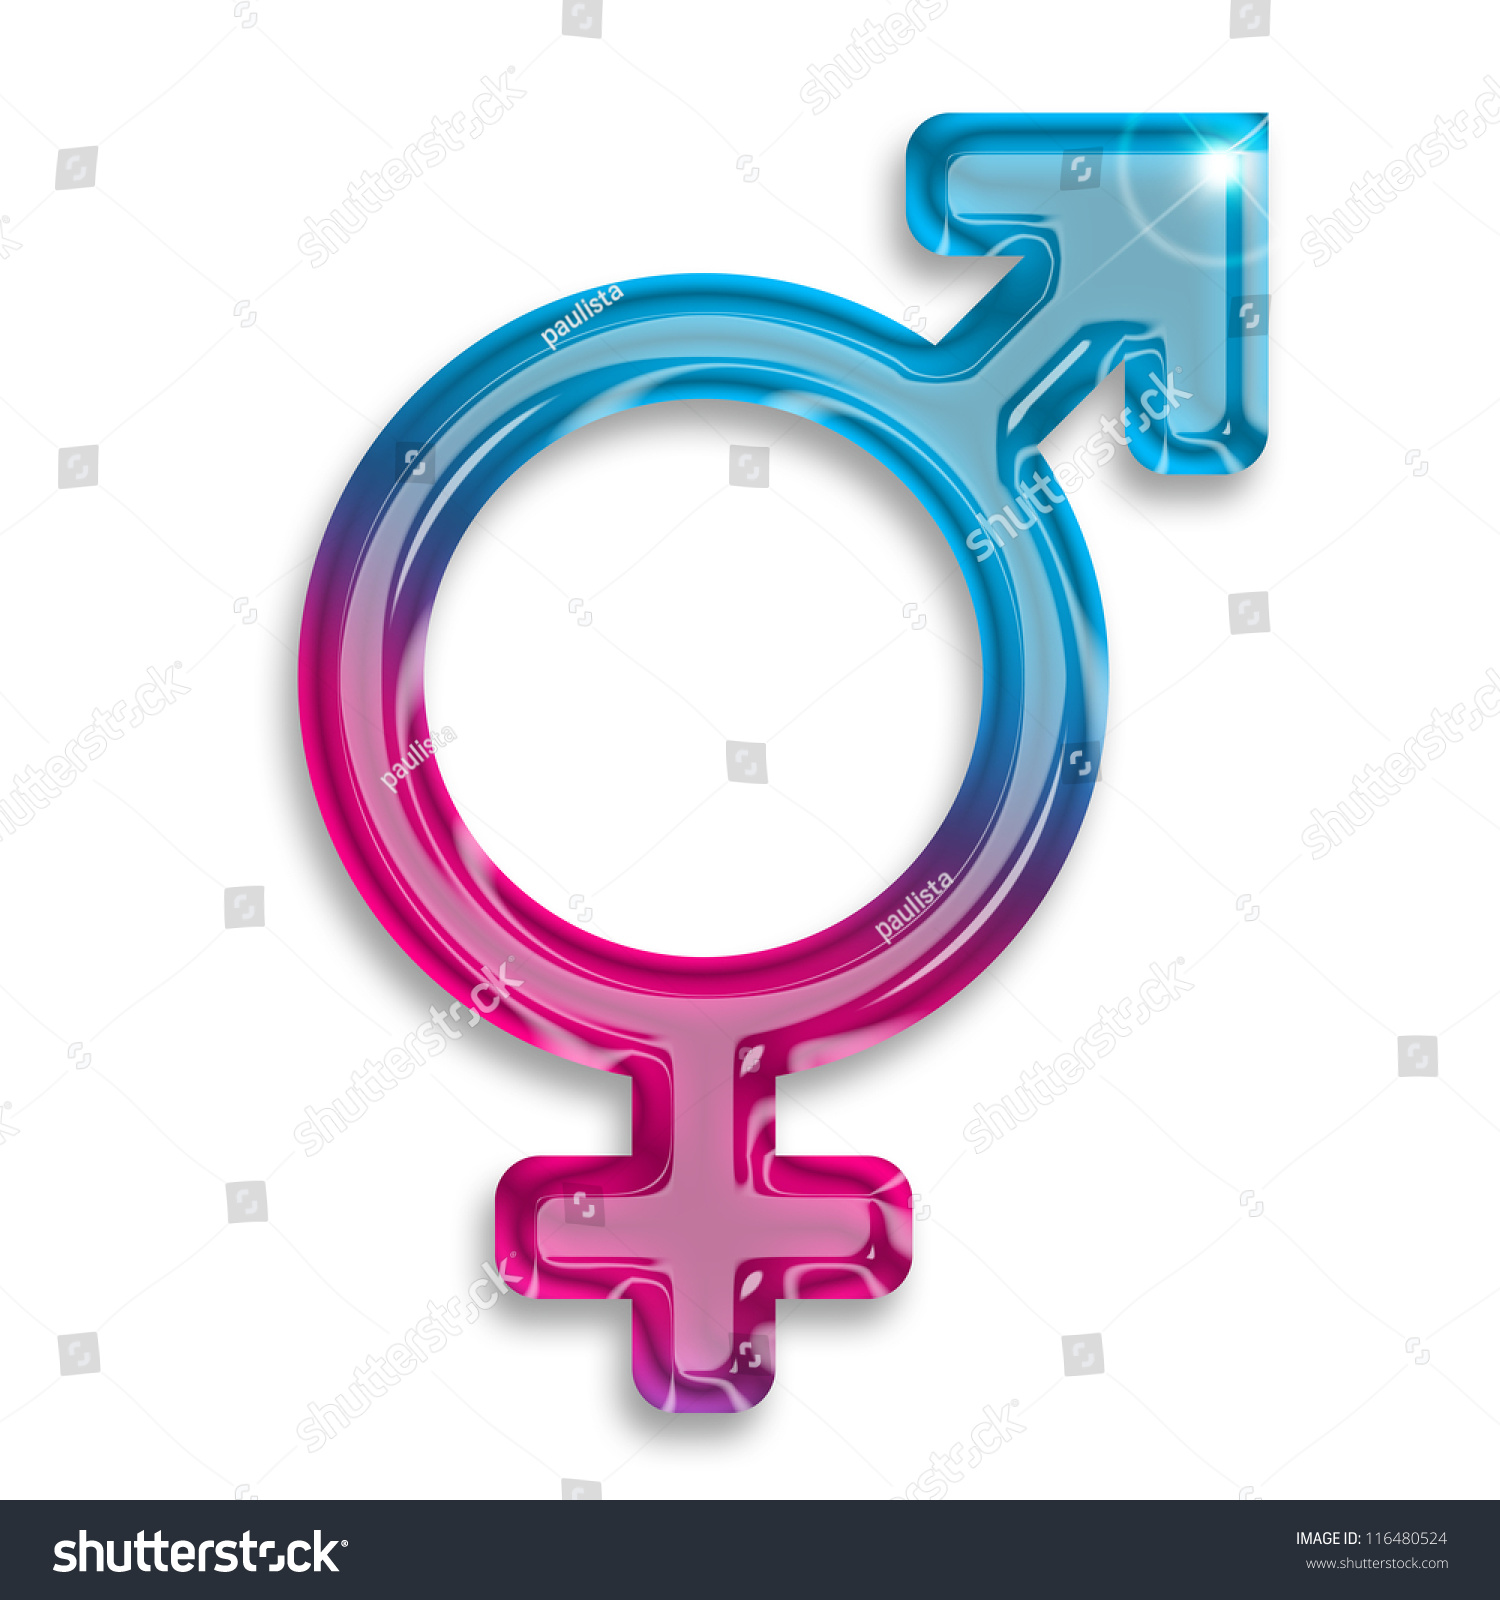 homo pige sex eventyrdrengene